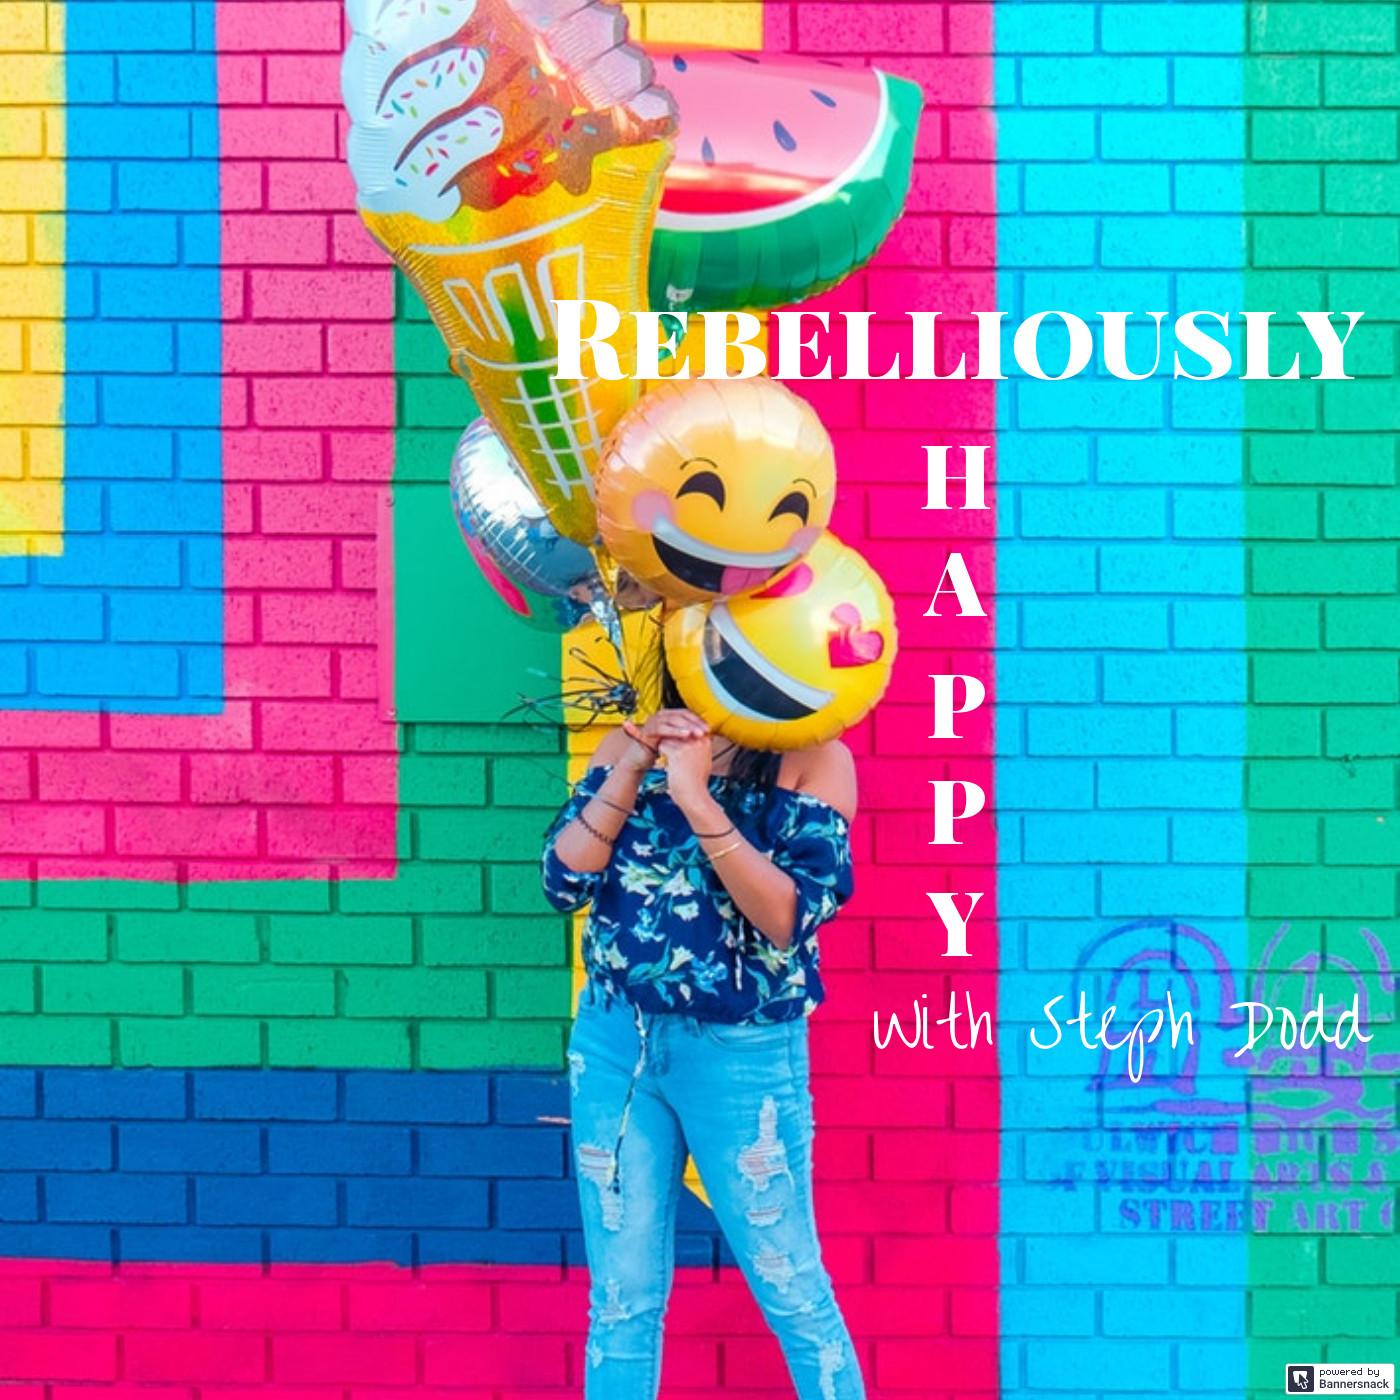 Rebelliously Happy Podcast Art2.jpg